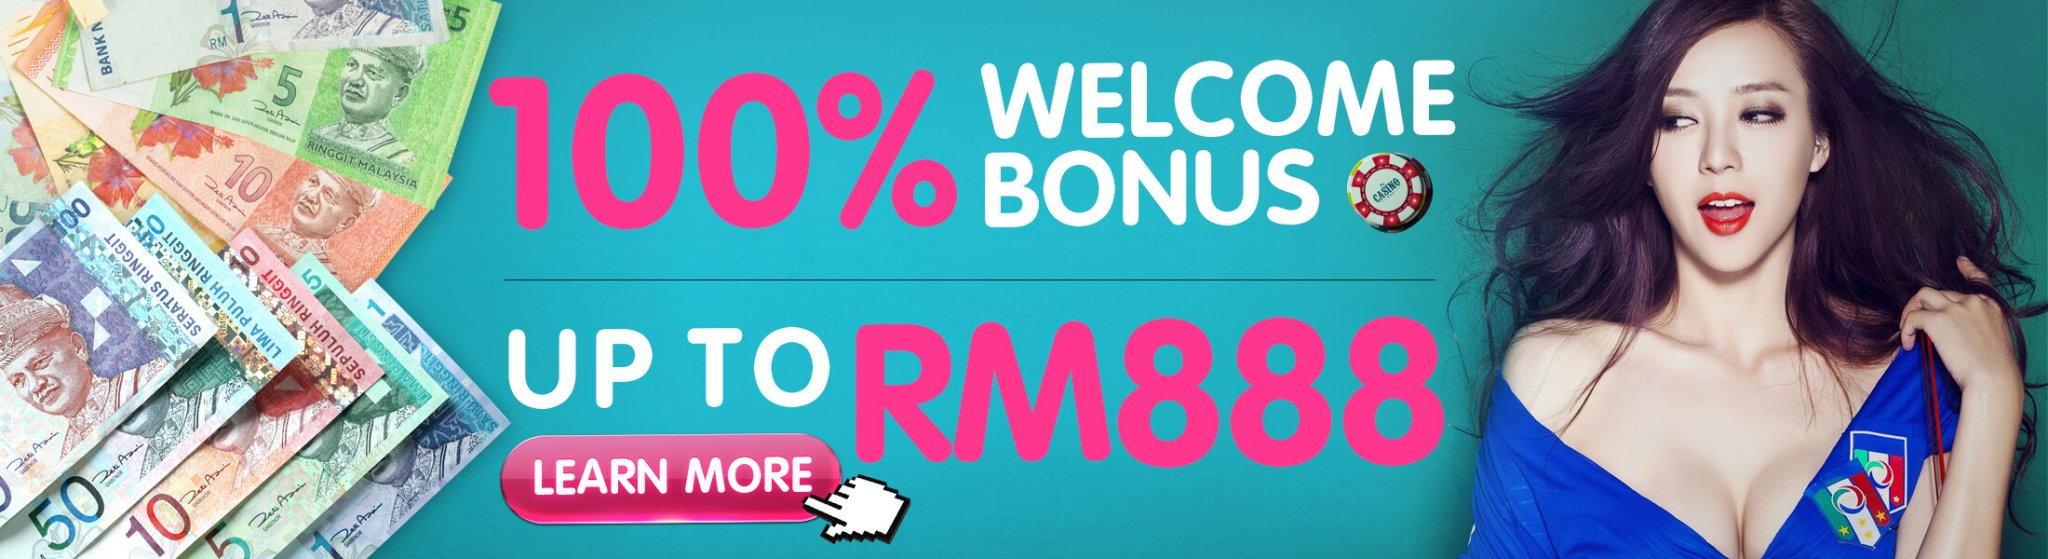 918Kiss(SCR888) New Member 100% Welcome Bonus Up to MYR888!